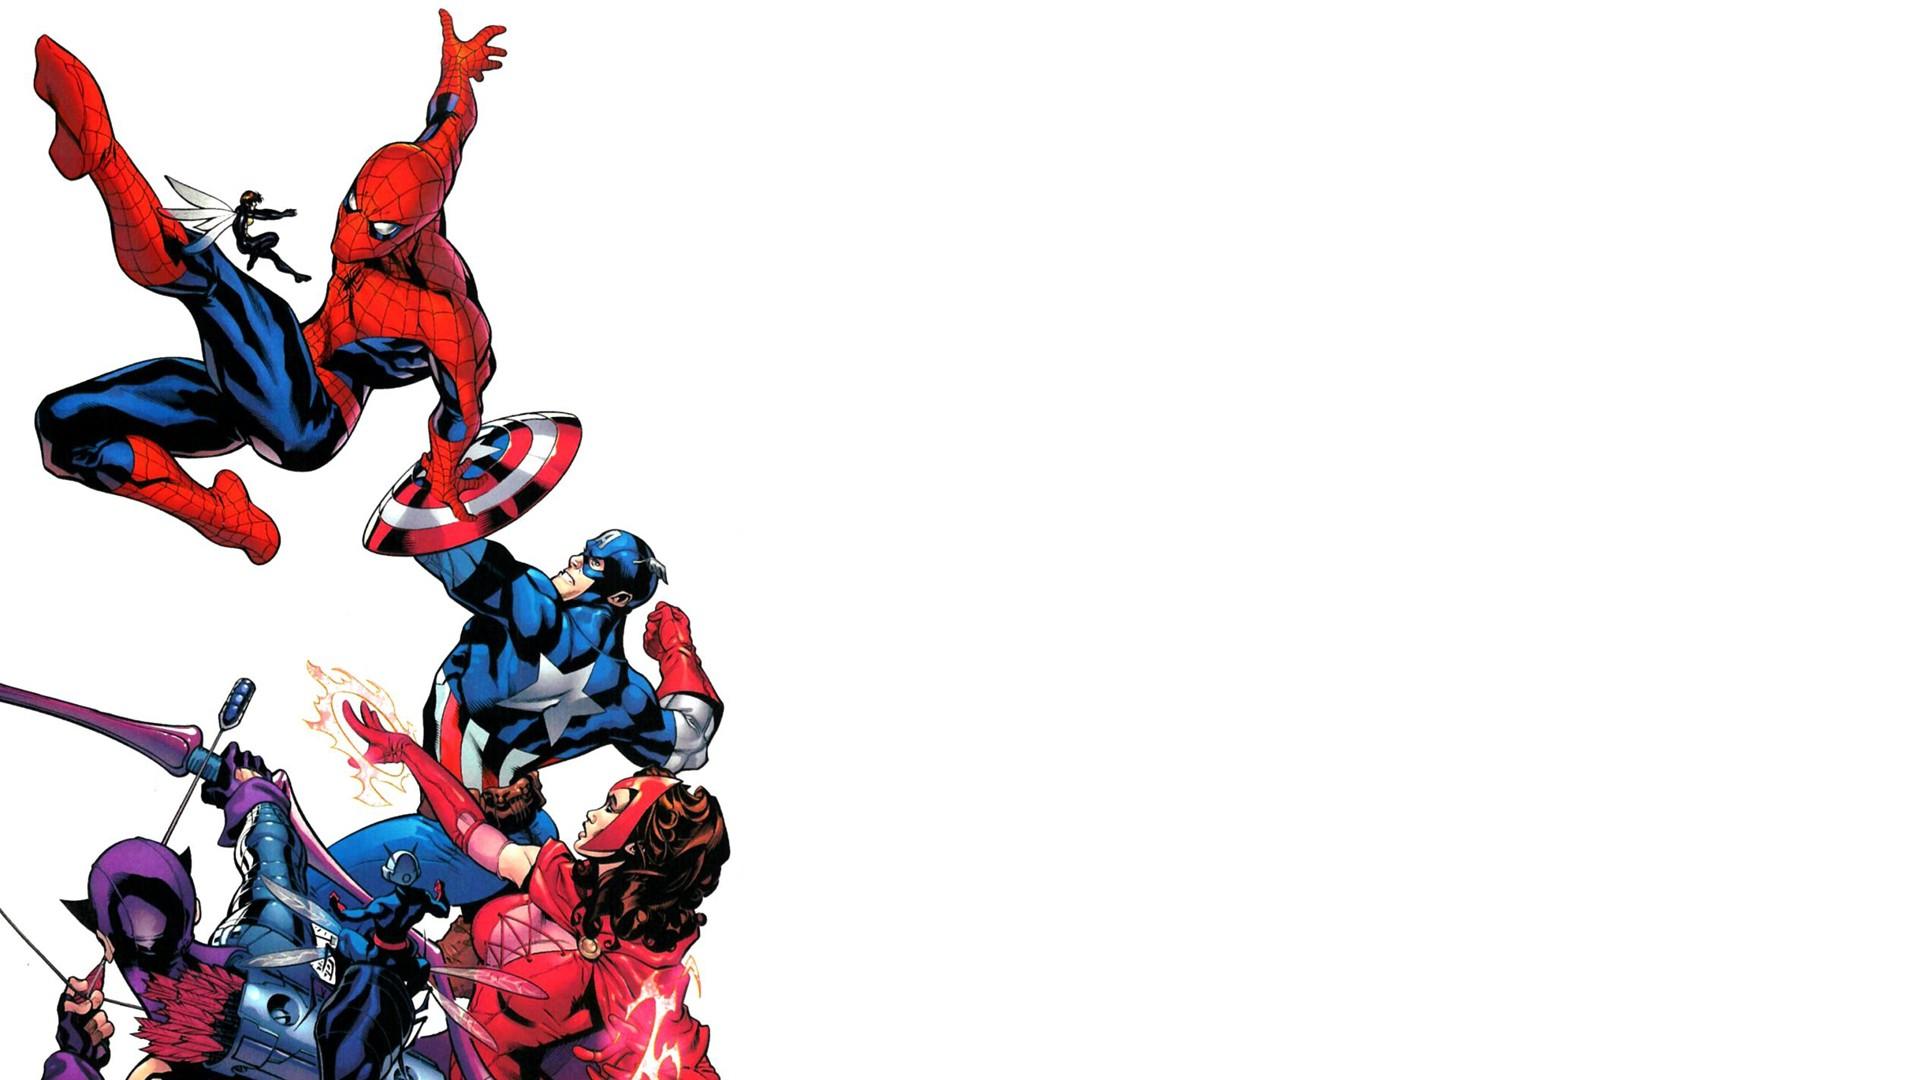 wallpaper : 1920x1080 px, captain america, comics, hawkeye, spider